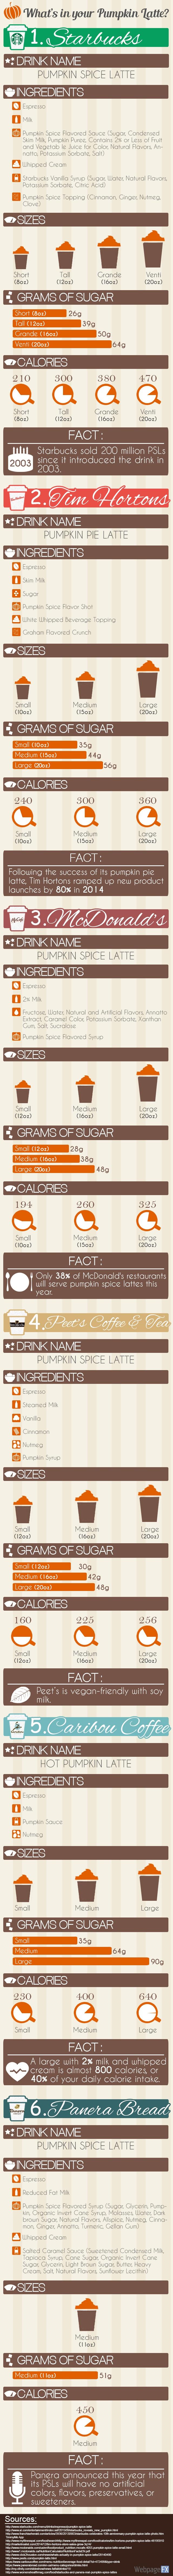 pumpkin-latte-infographic